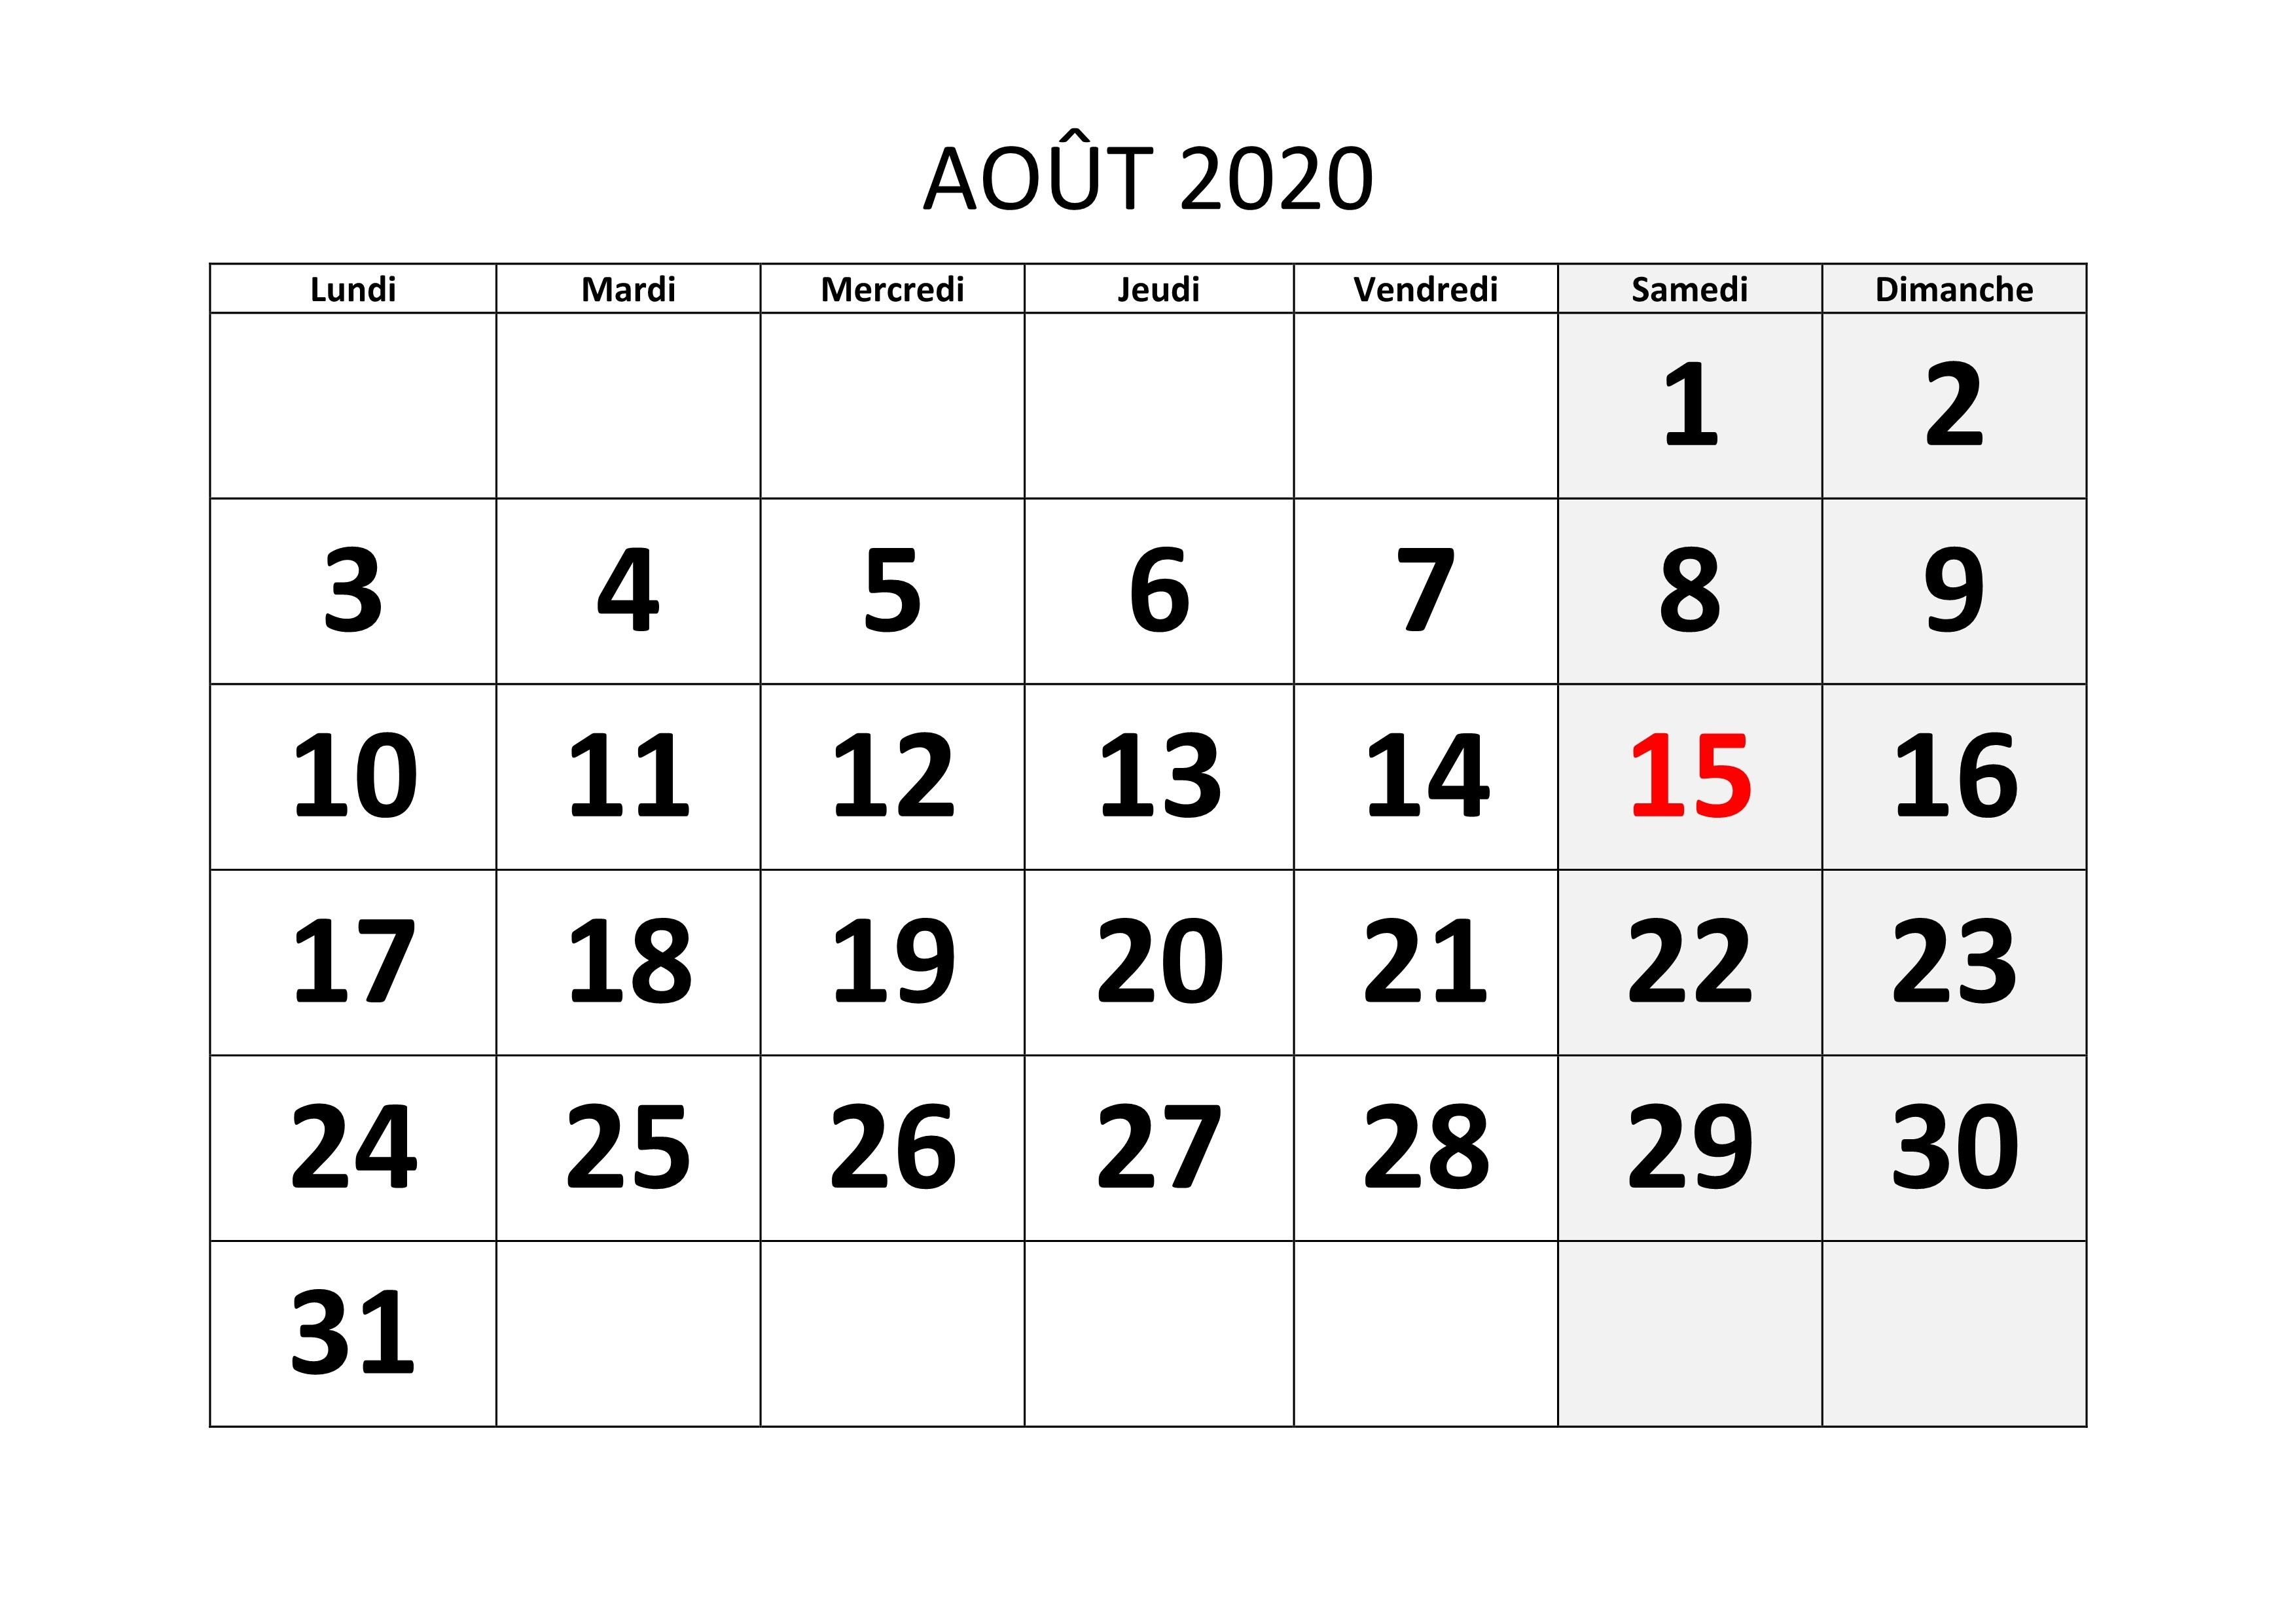 Calendrier Juillet Aout 2020.Calendrier Mensuel 2020 A Imprimer Calendrier Mensuel Jours